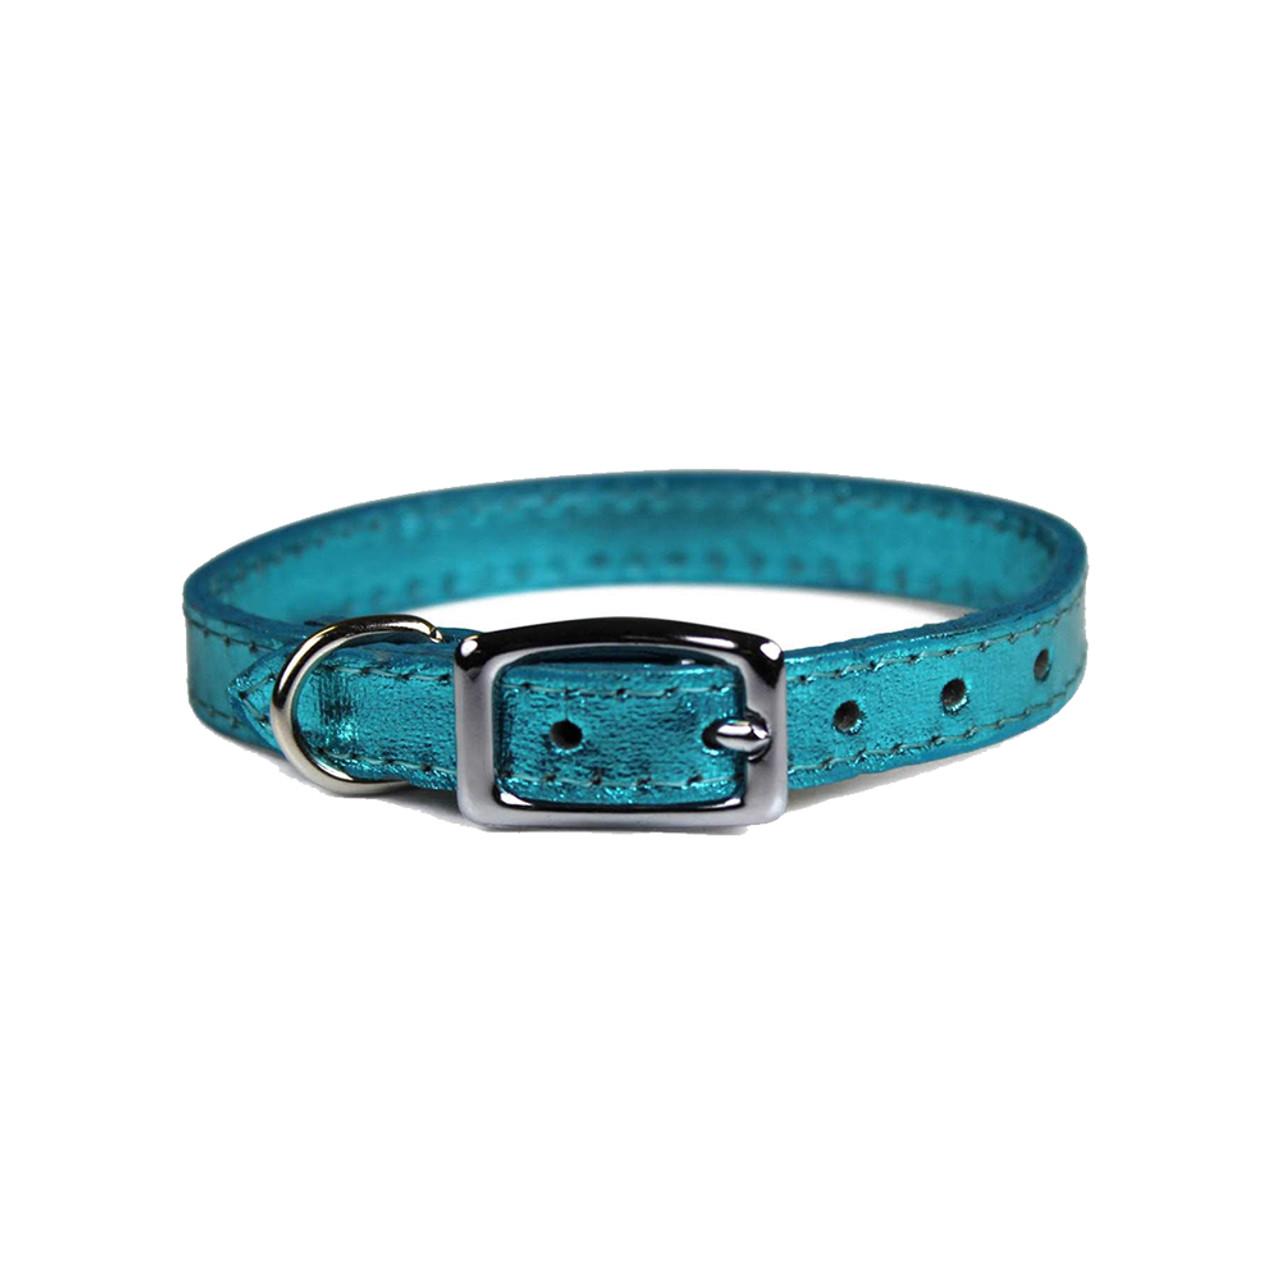 Pocket Pups Metallic Turquoise Small Leather Dog Collar